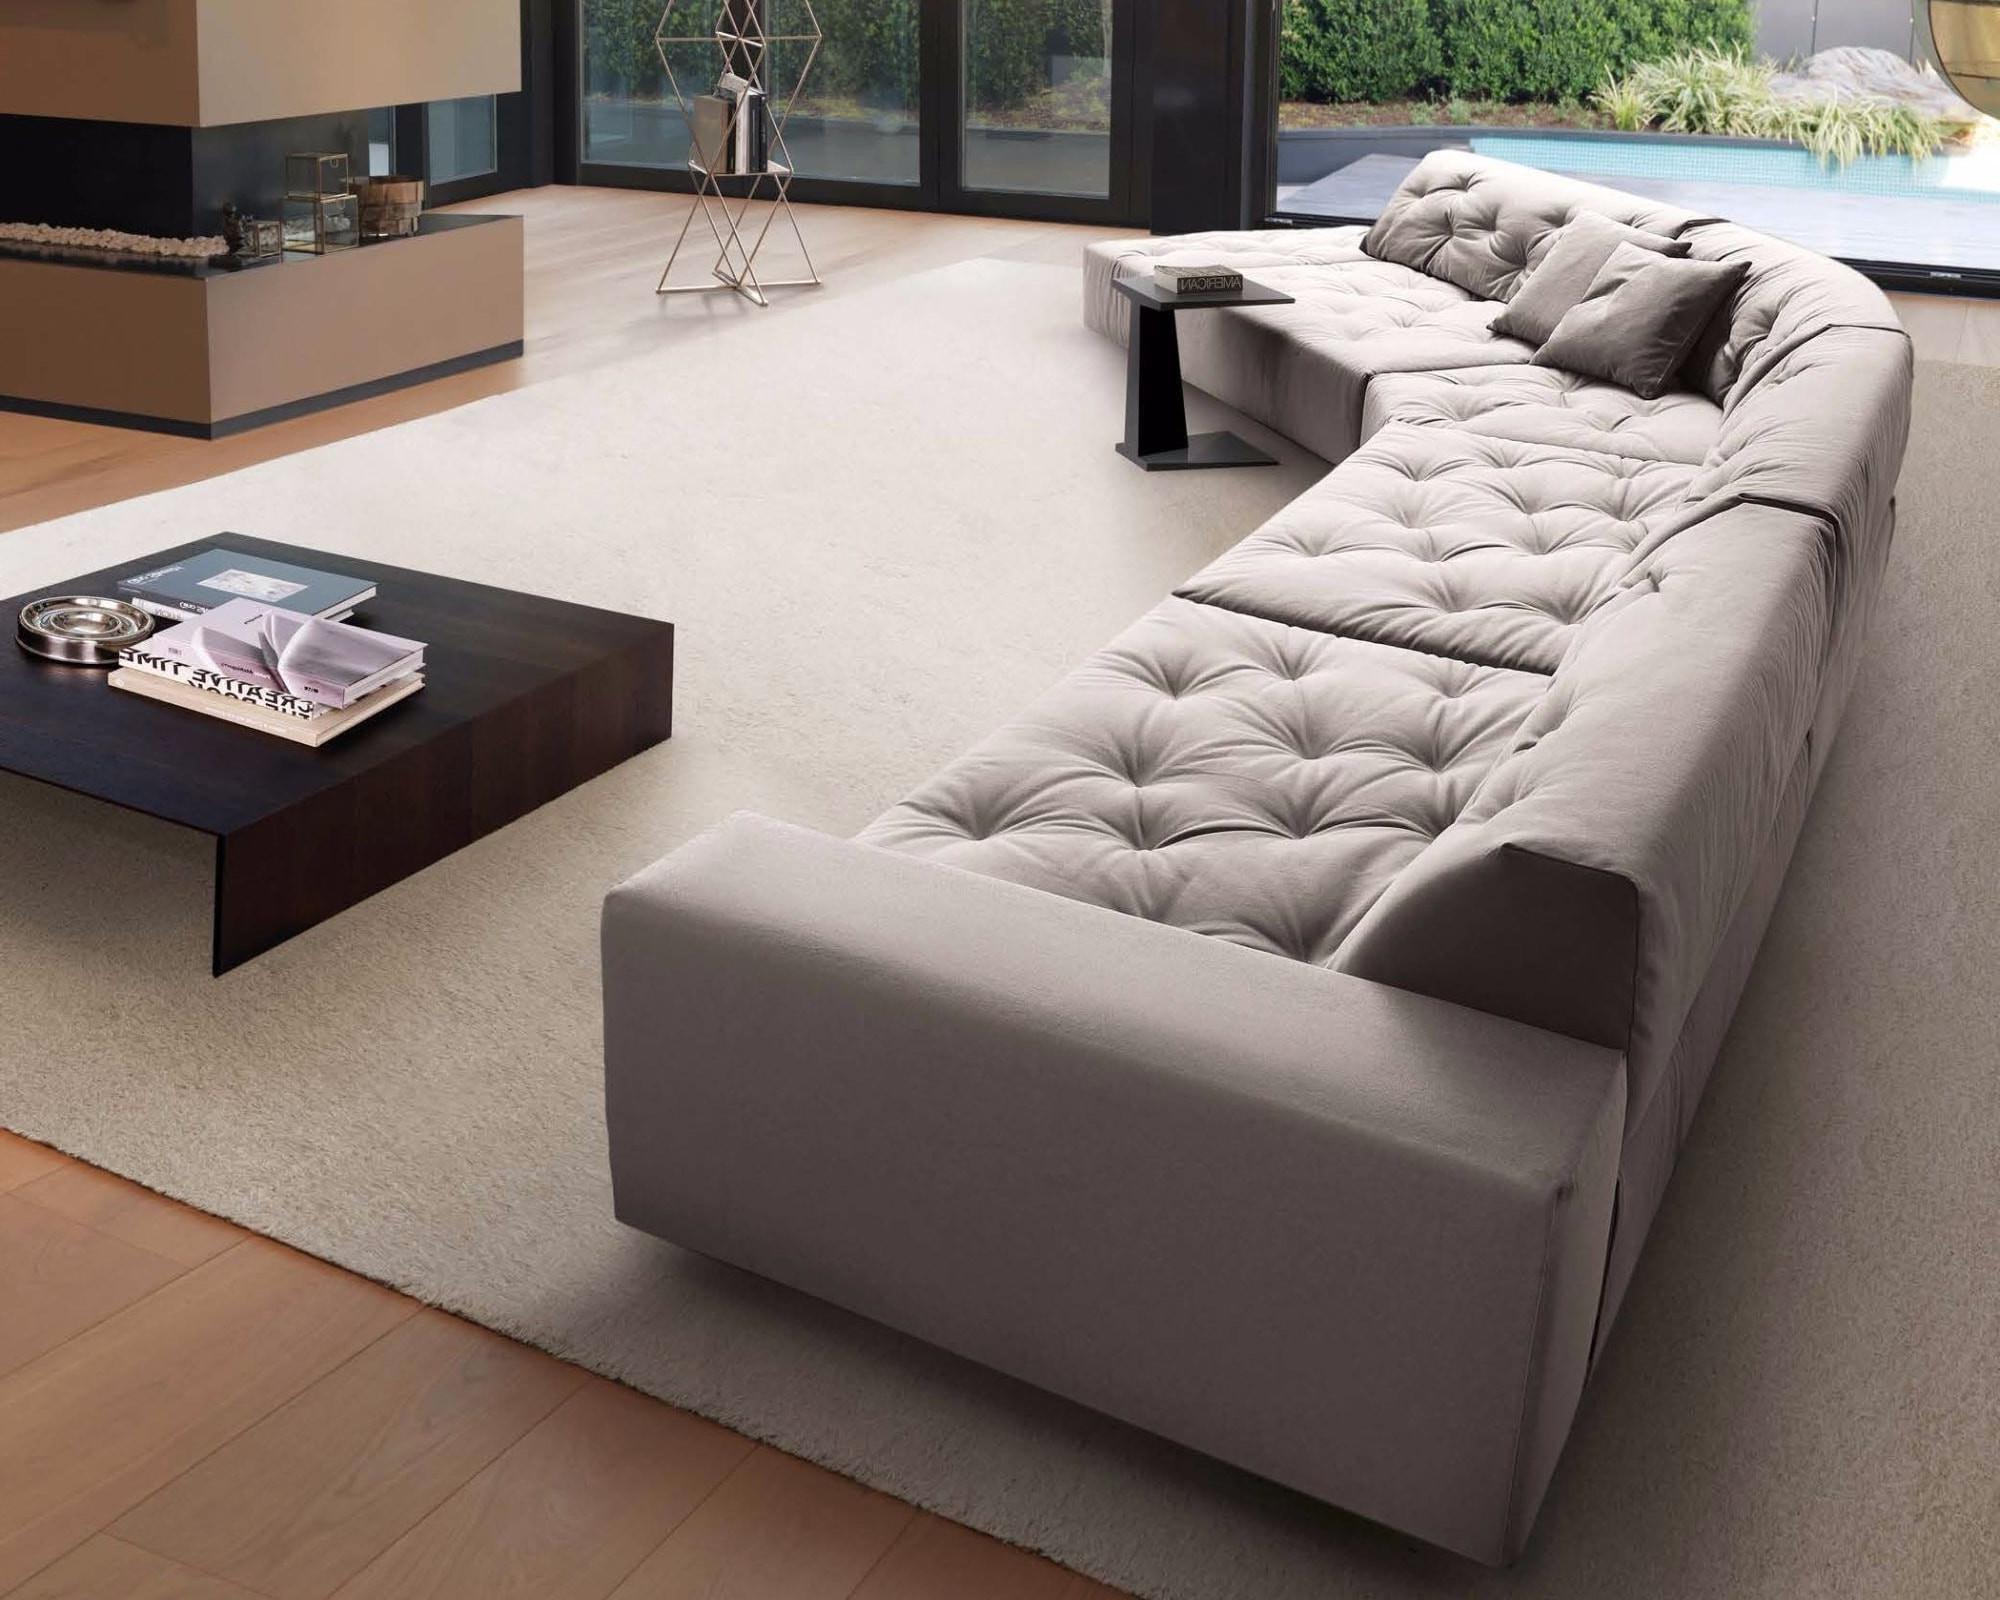 Ok sofas Catalogo Gdd0 Chance sofa Products